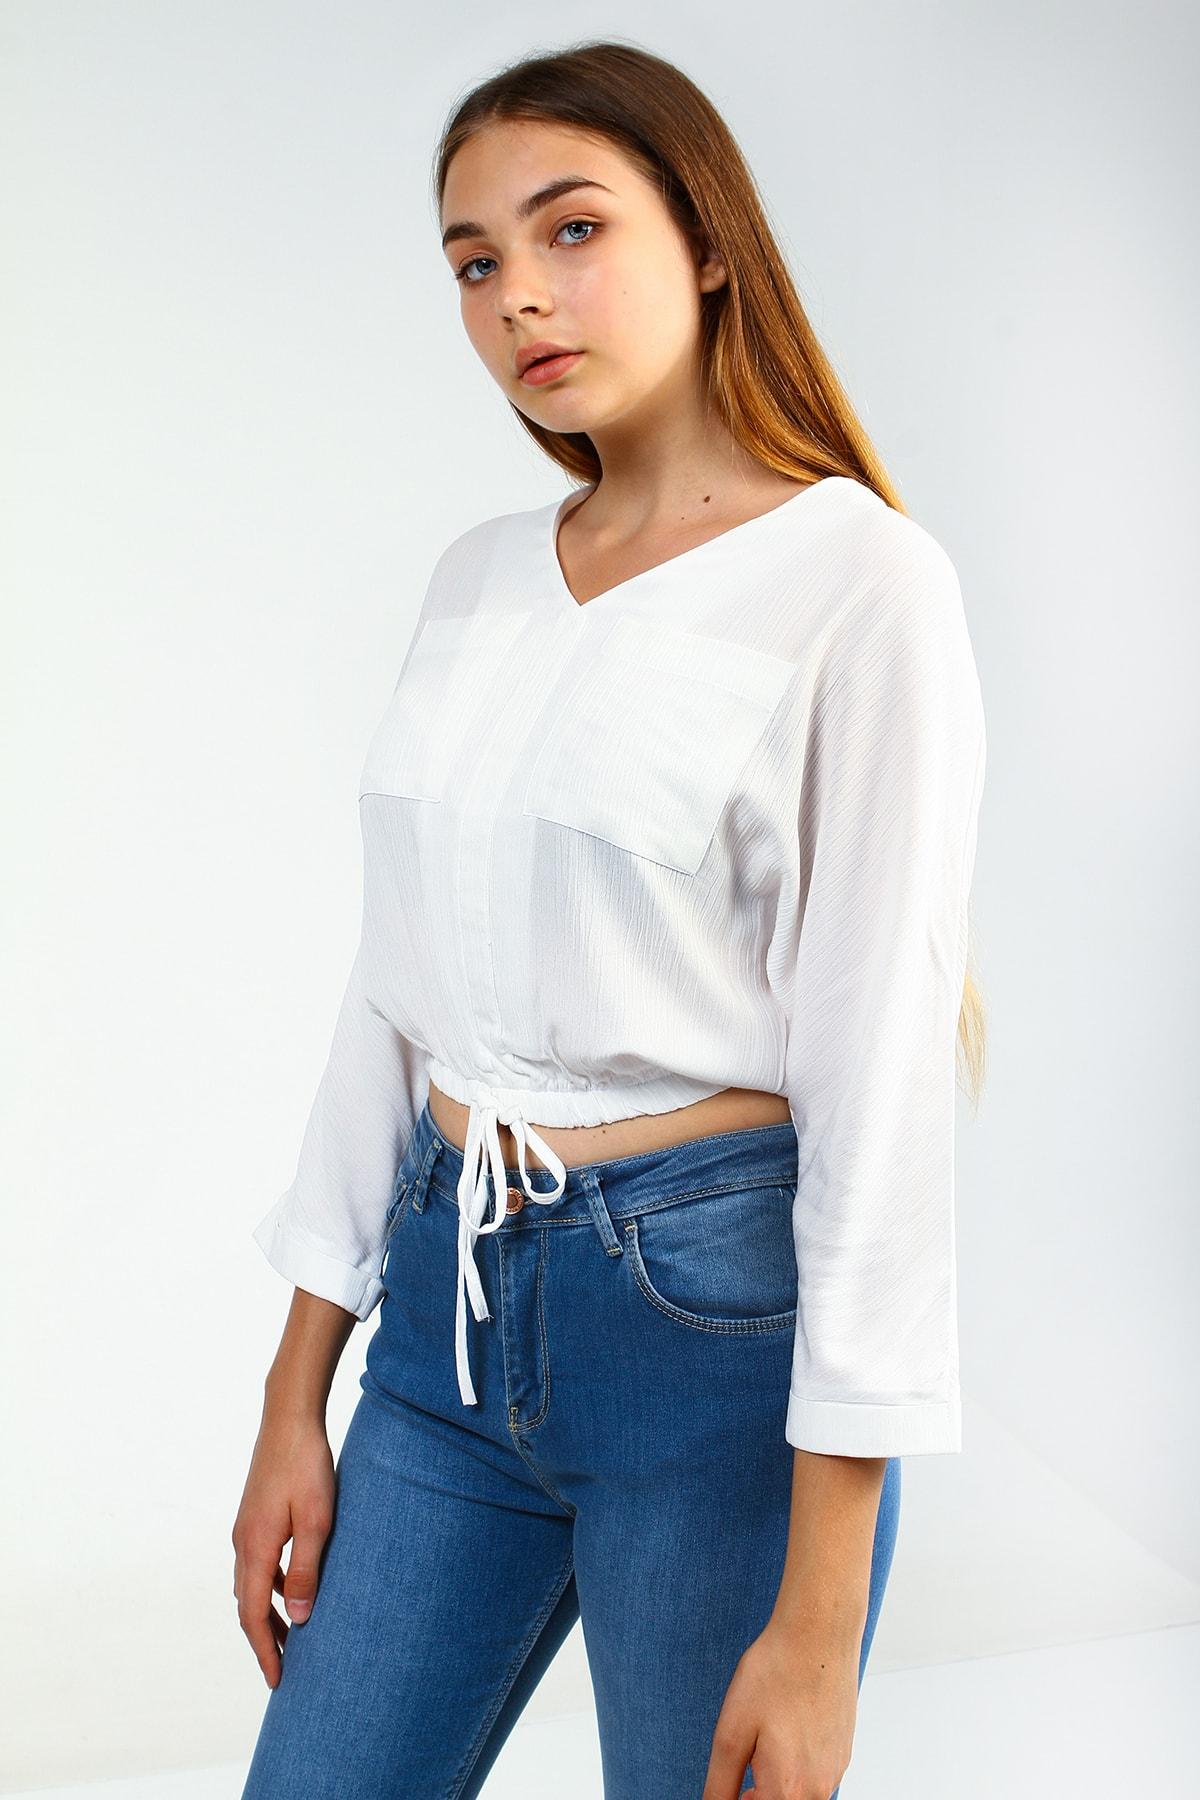 بلوز کراپ سفید گتر جیب دار کوتون